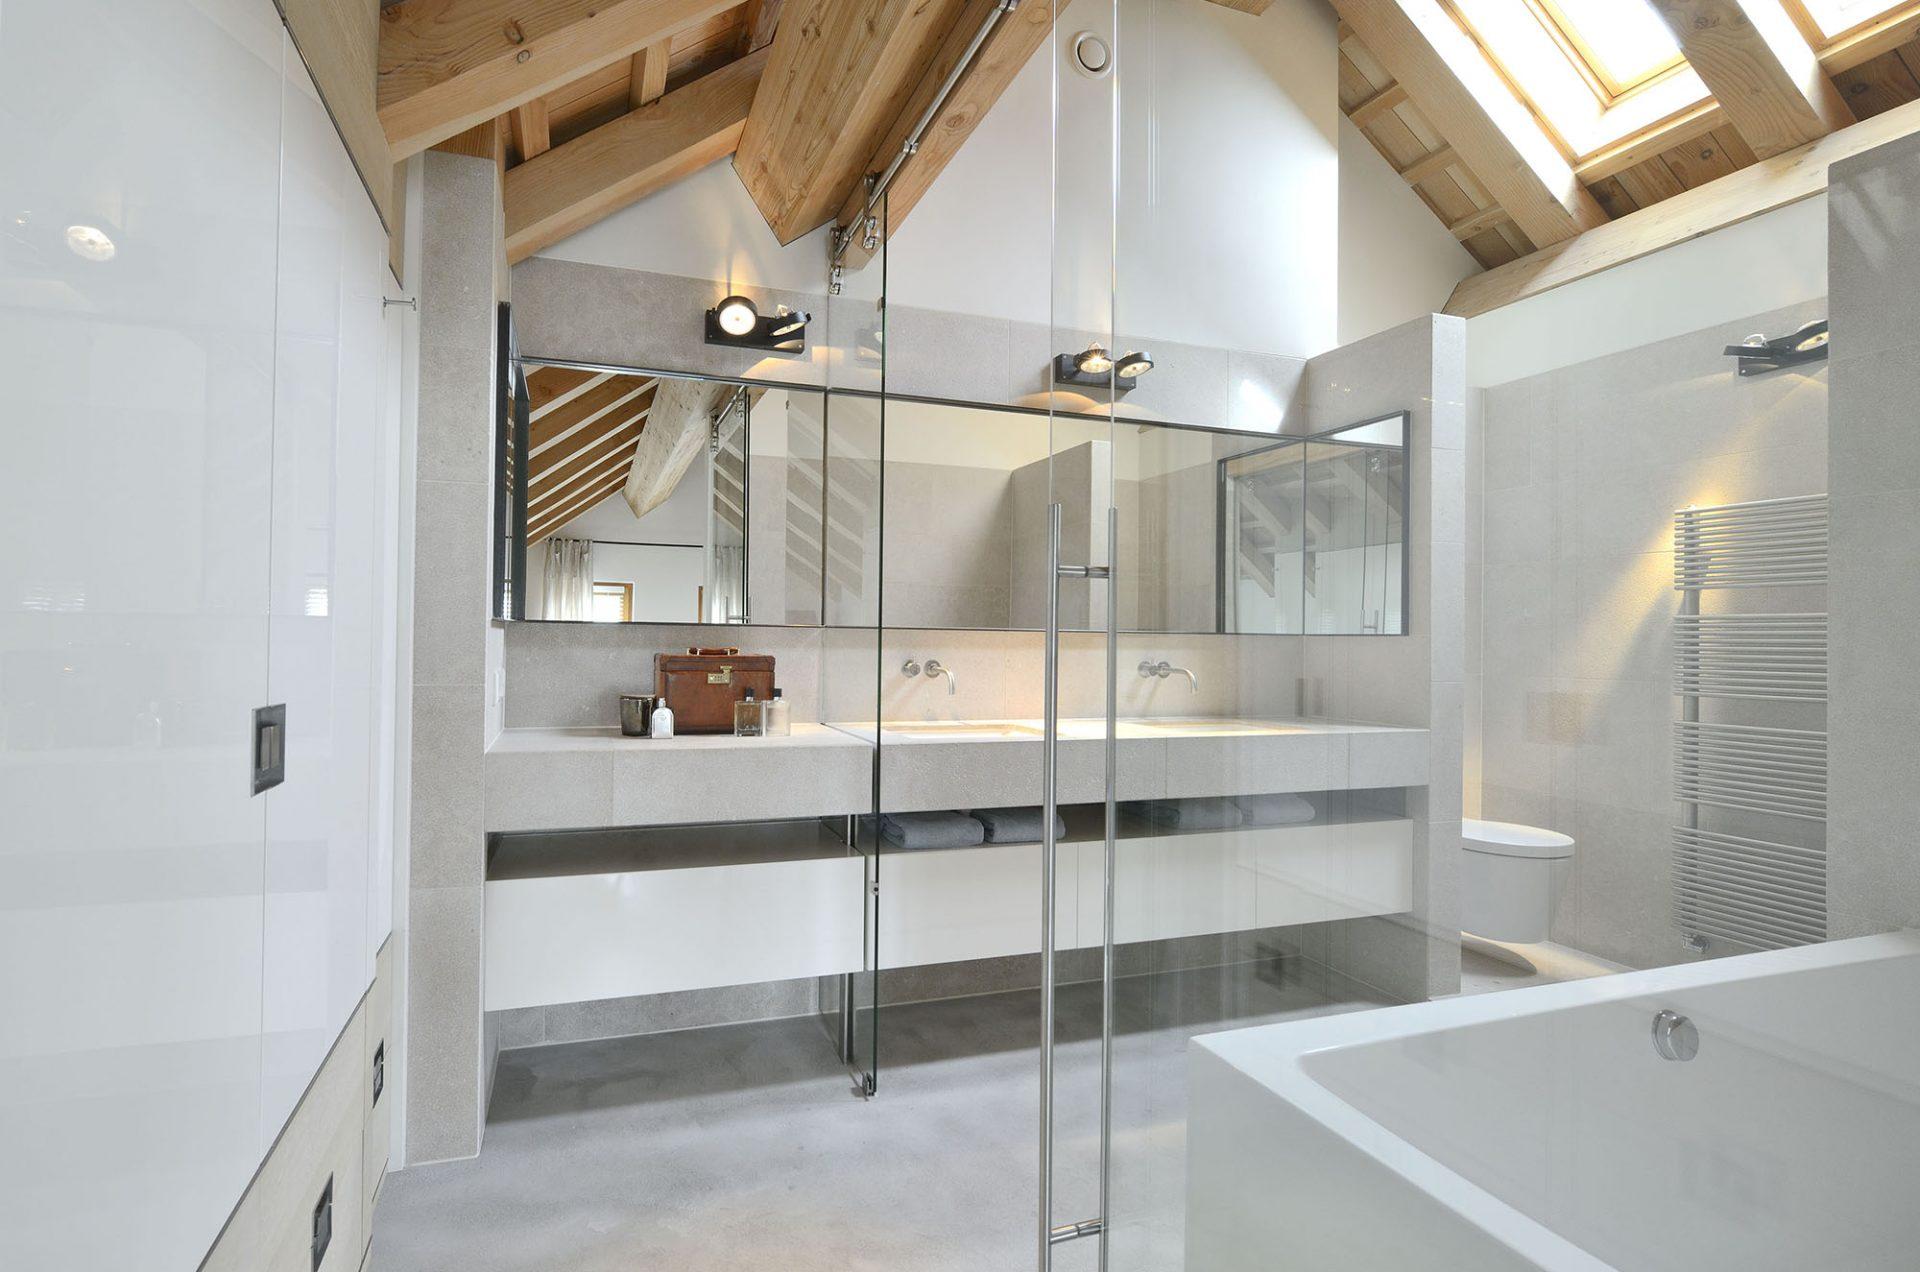 Warme Rustieke Badkamer : Signature badkamer ontwerpen emyko residential interior design